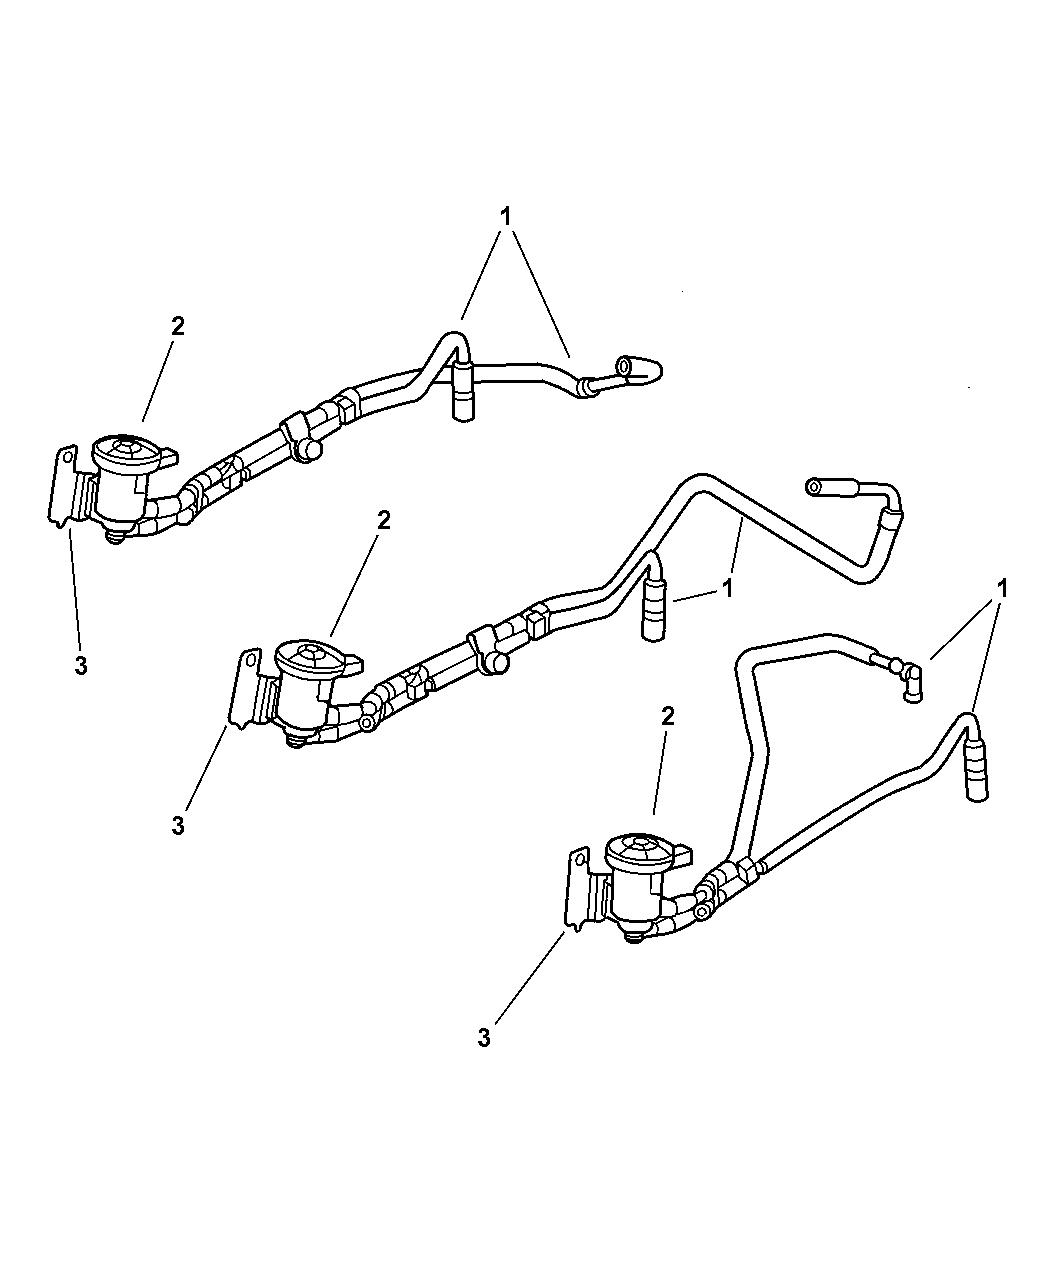 2001 dodge caravan emission harness